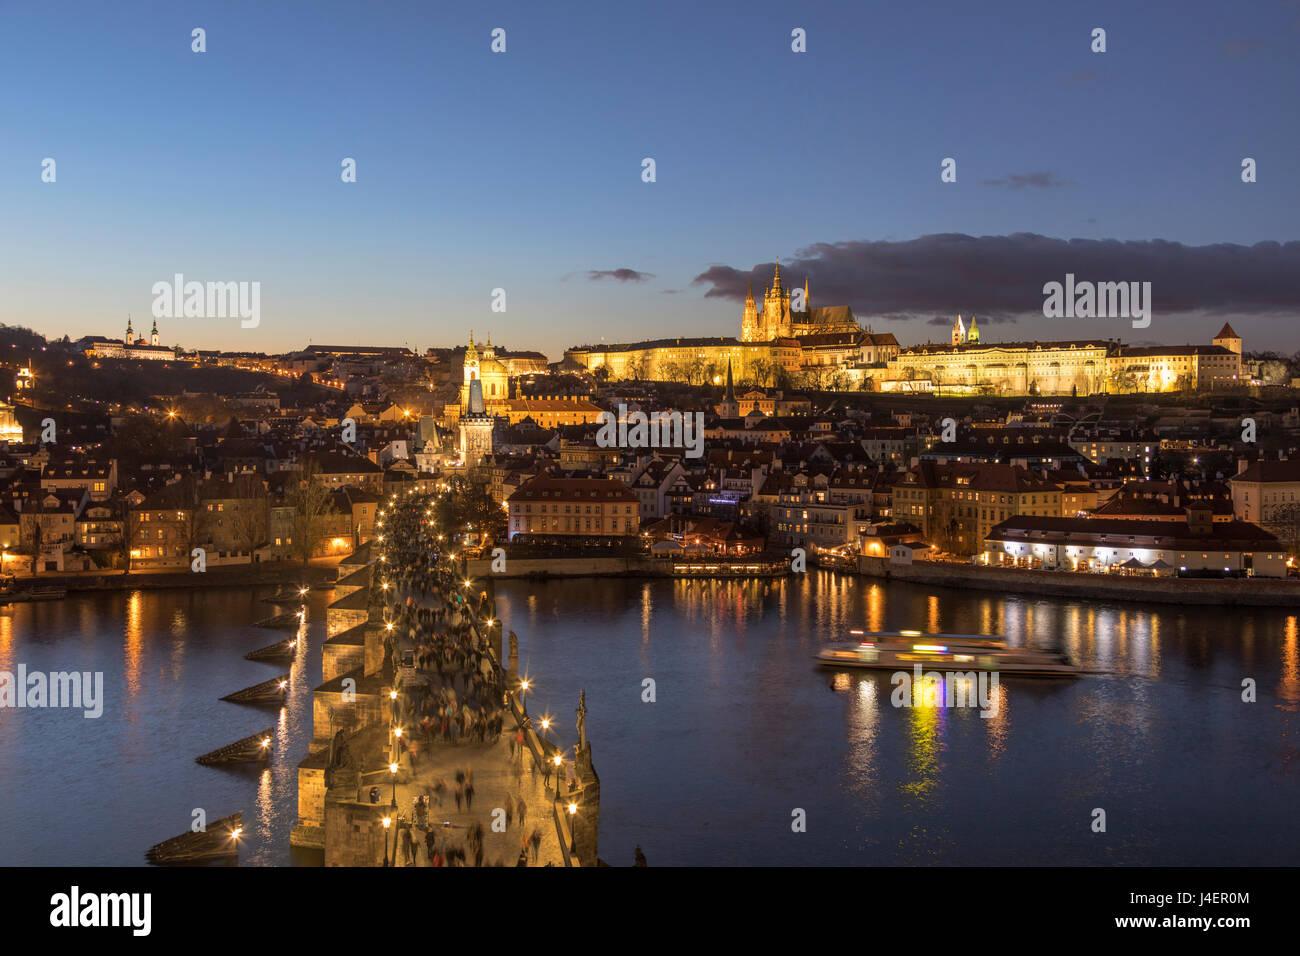 Vltava River and Charles Bridge at dusk, UNESCO World Heritage Site, Prague, Czech Republic, Europe - Stock Image